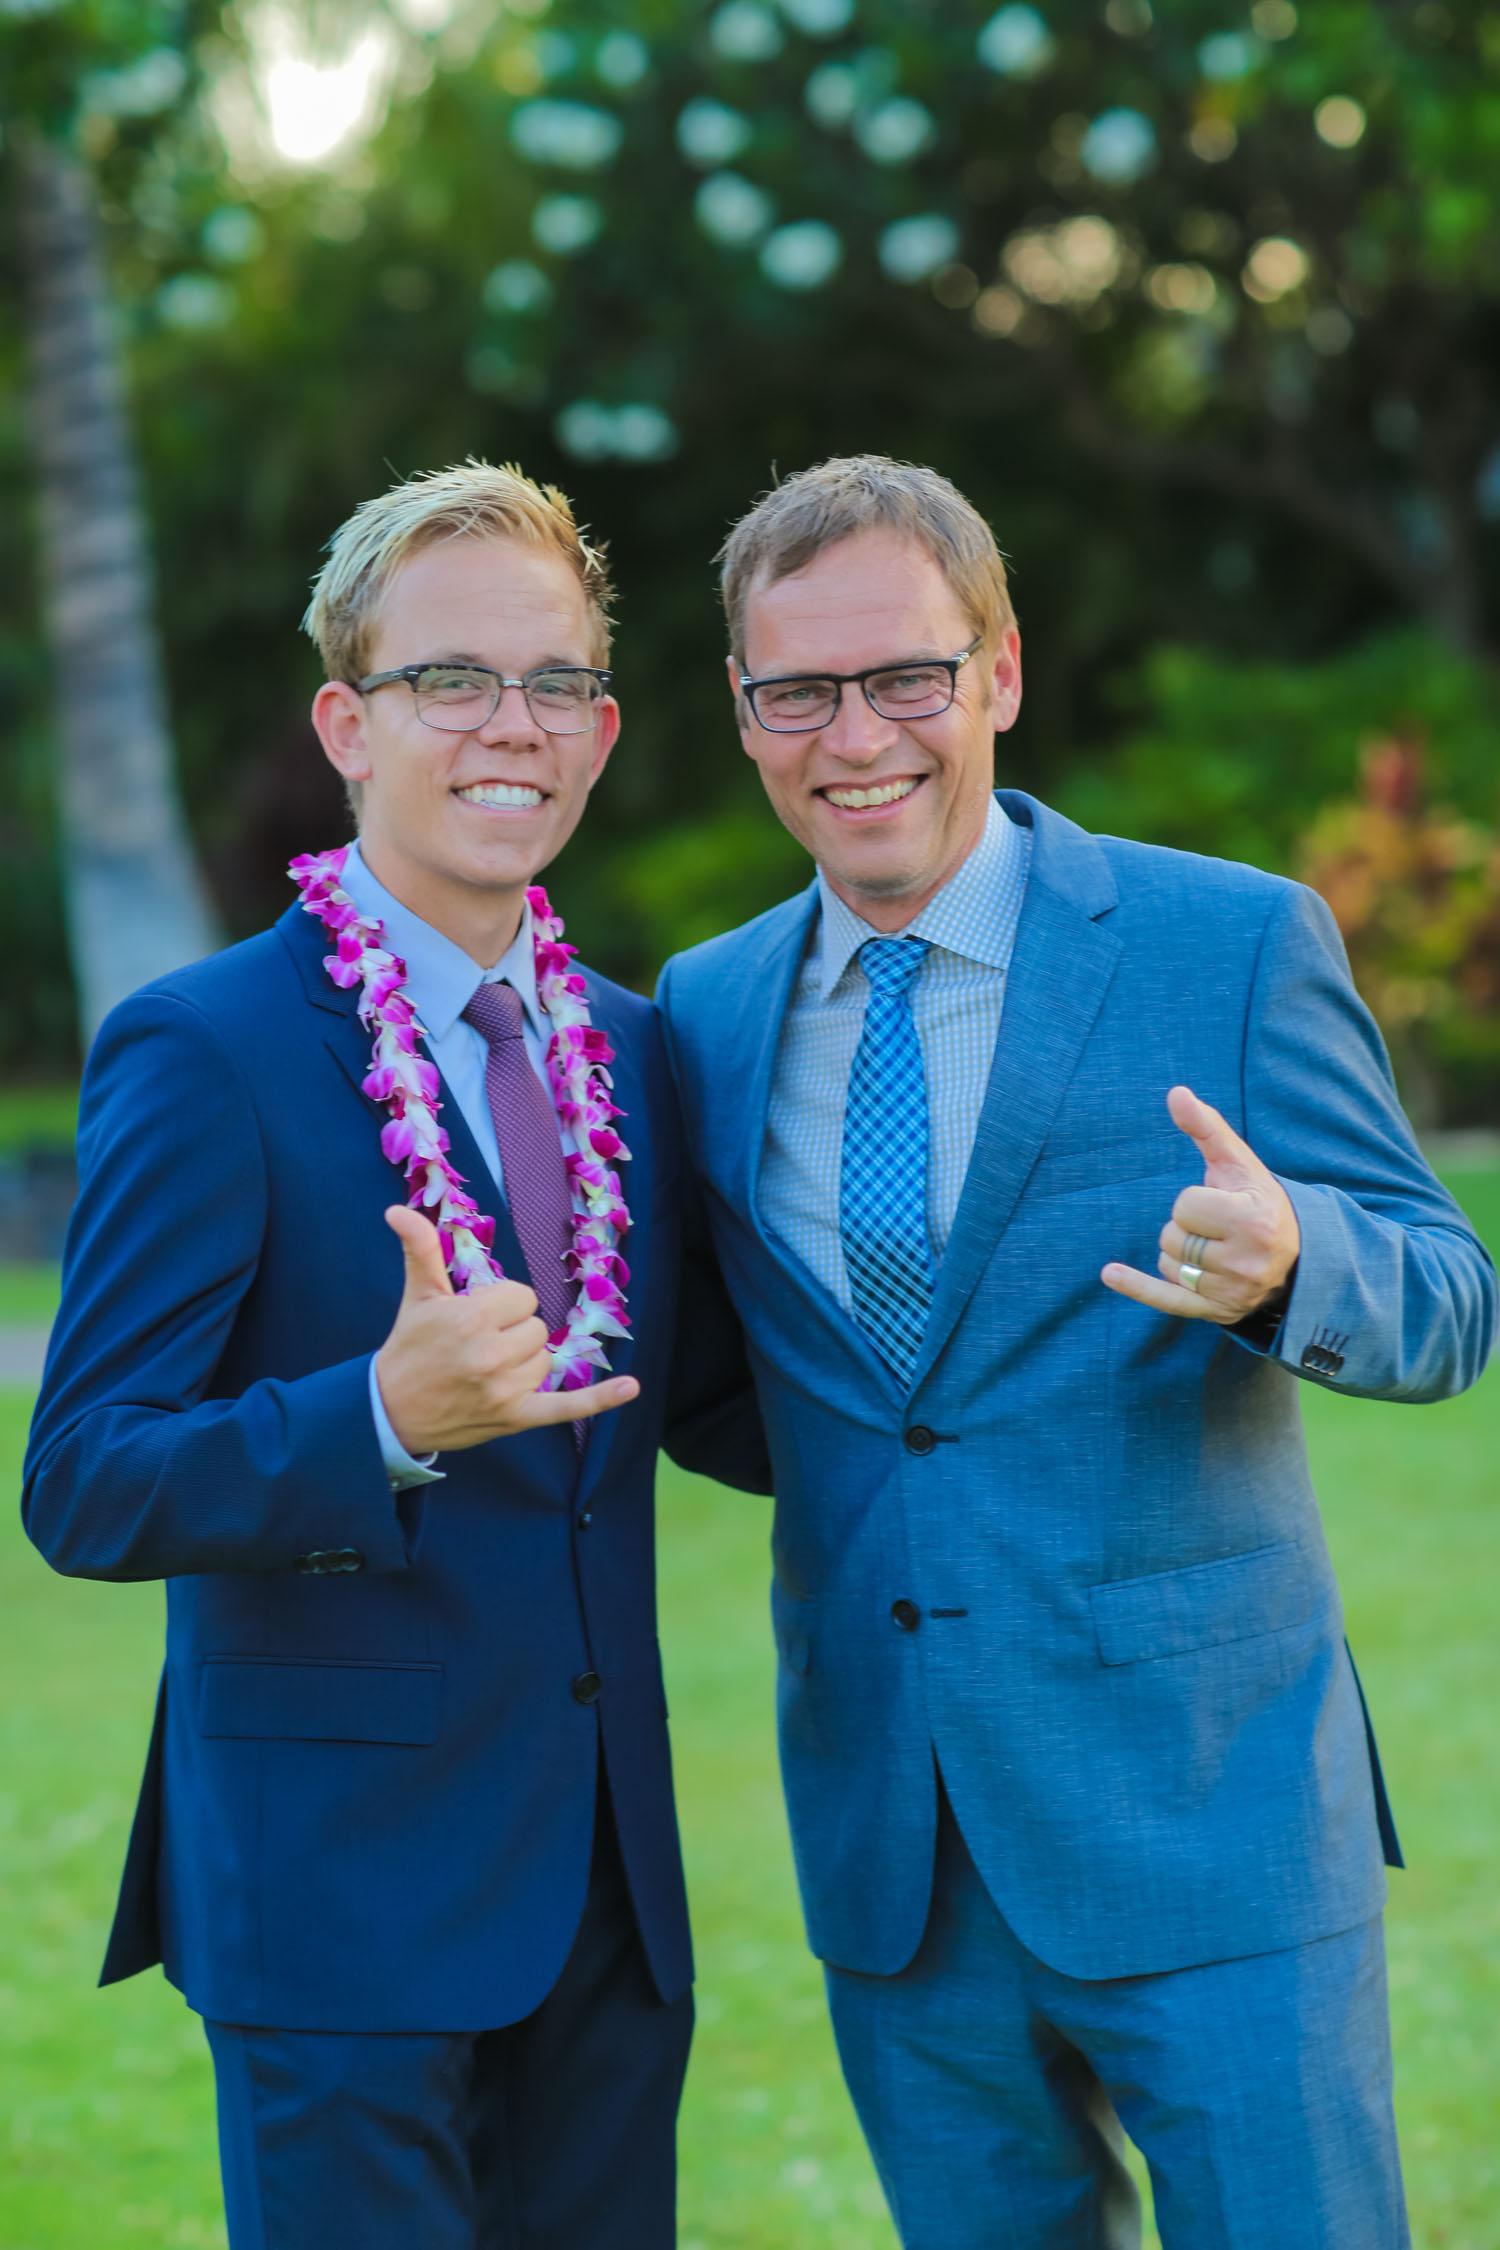 Corporate People photography company Hawaii